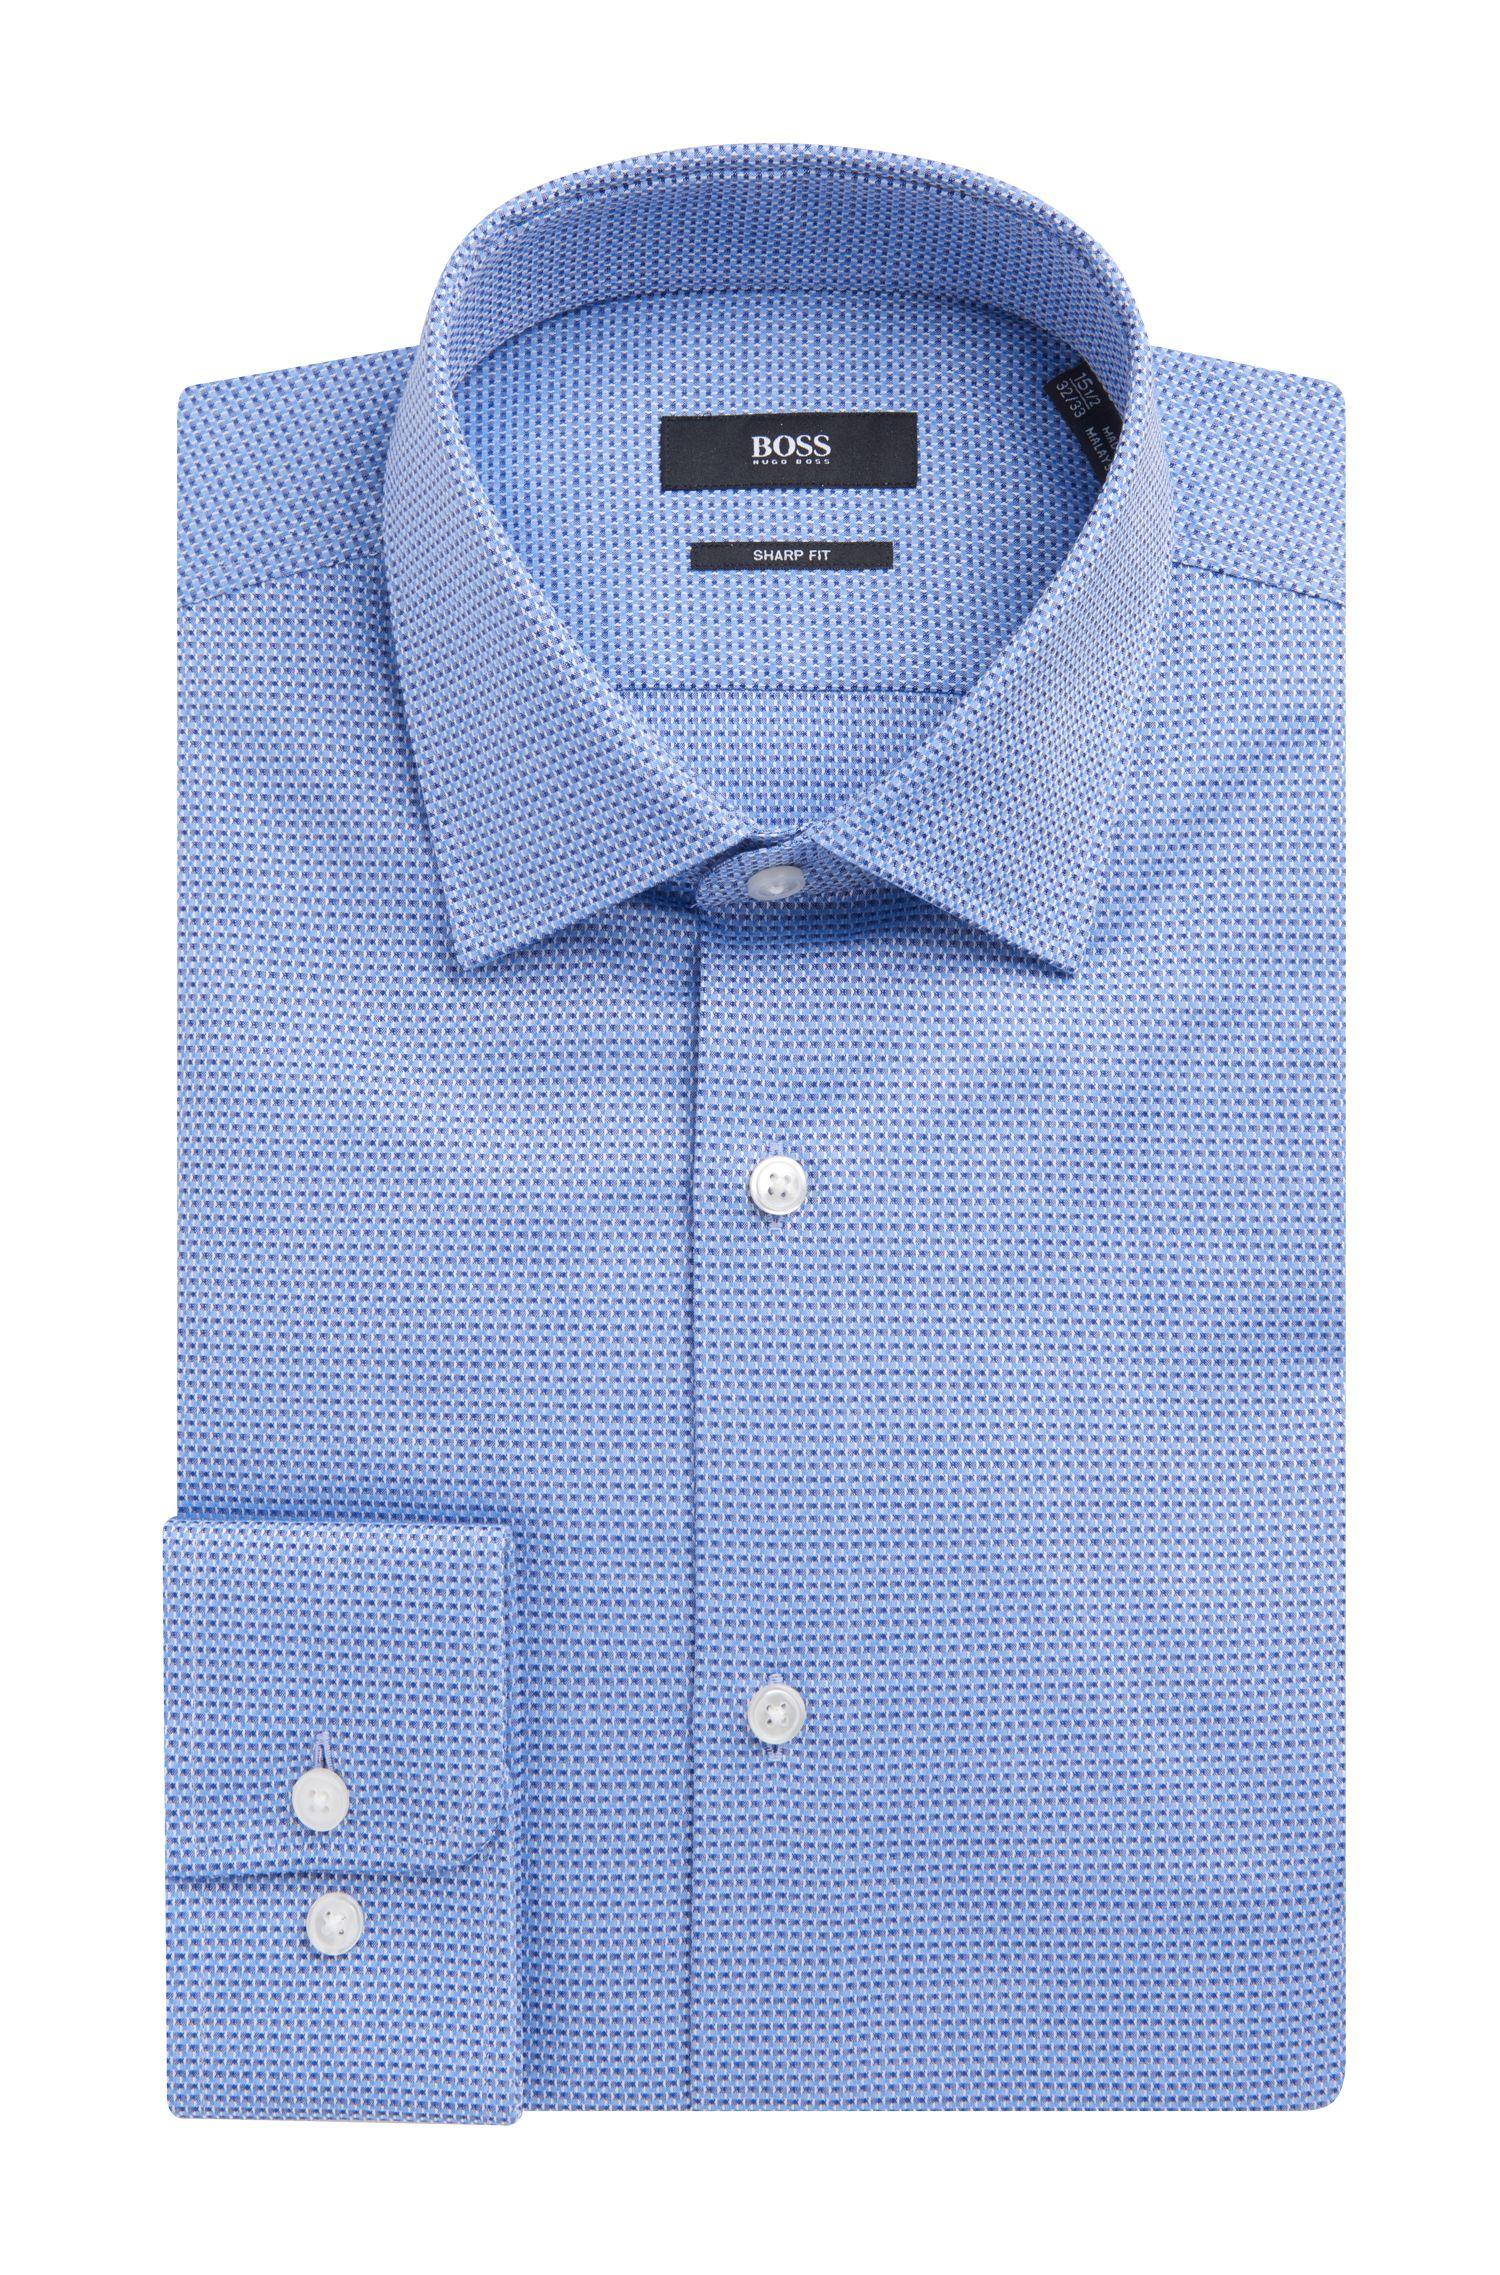 Basketweave Cotton Dress Shirt, Sharp Fit   Marley US, Blue